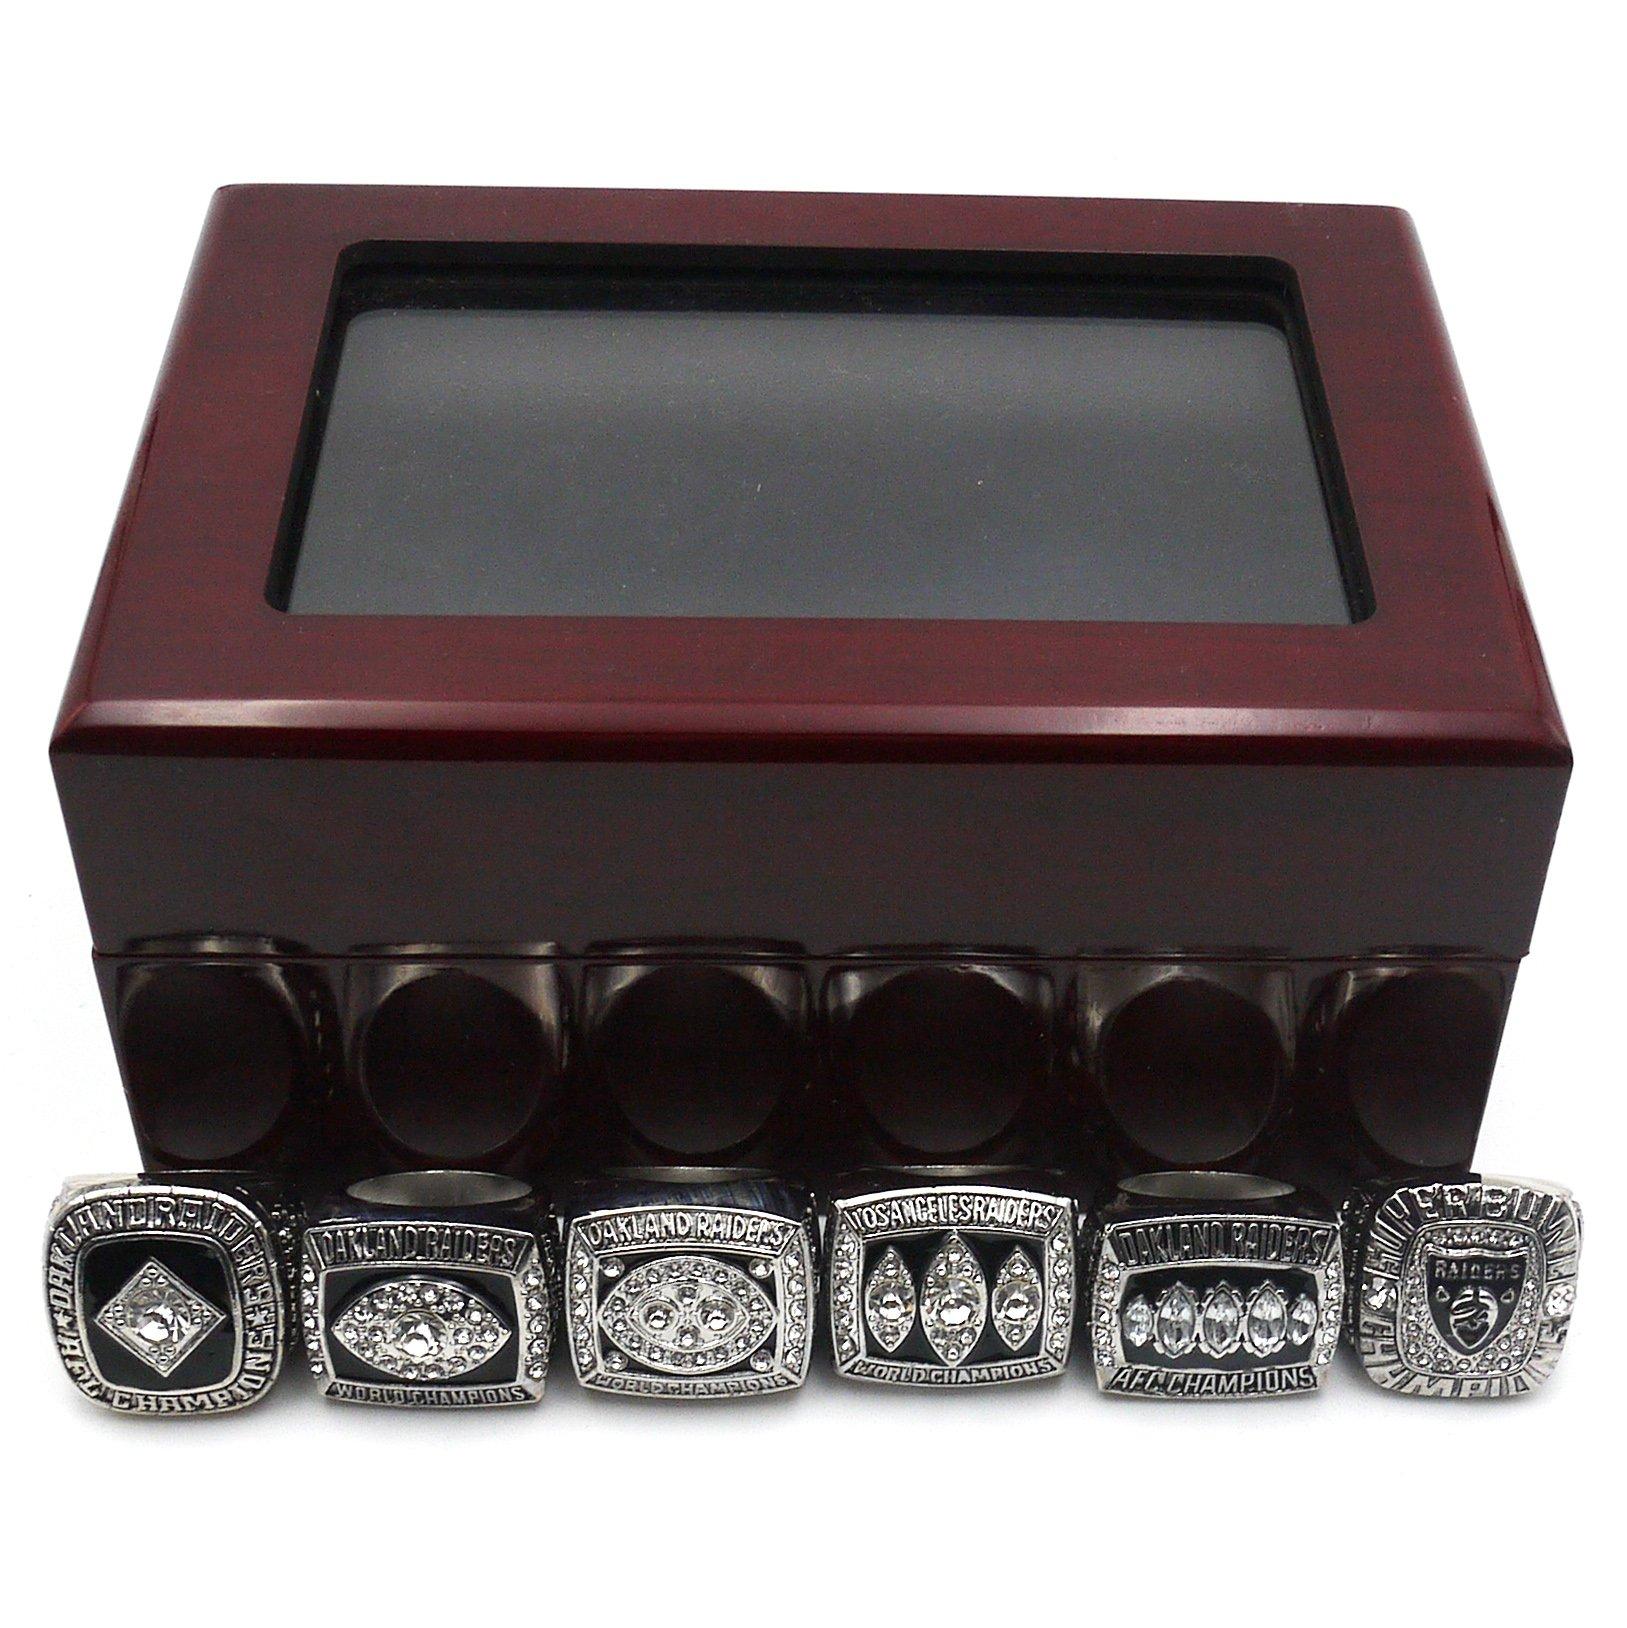 Vonscool 6pcs + Wooden Box Set 1967 1976 1980 1983 2002 2014 Oakland Raiders Championship Ring Size 11 Fan Men Gifts